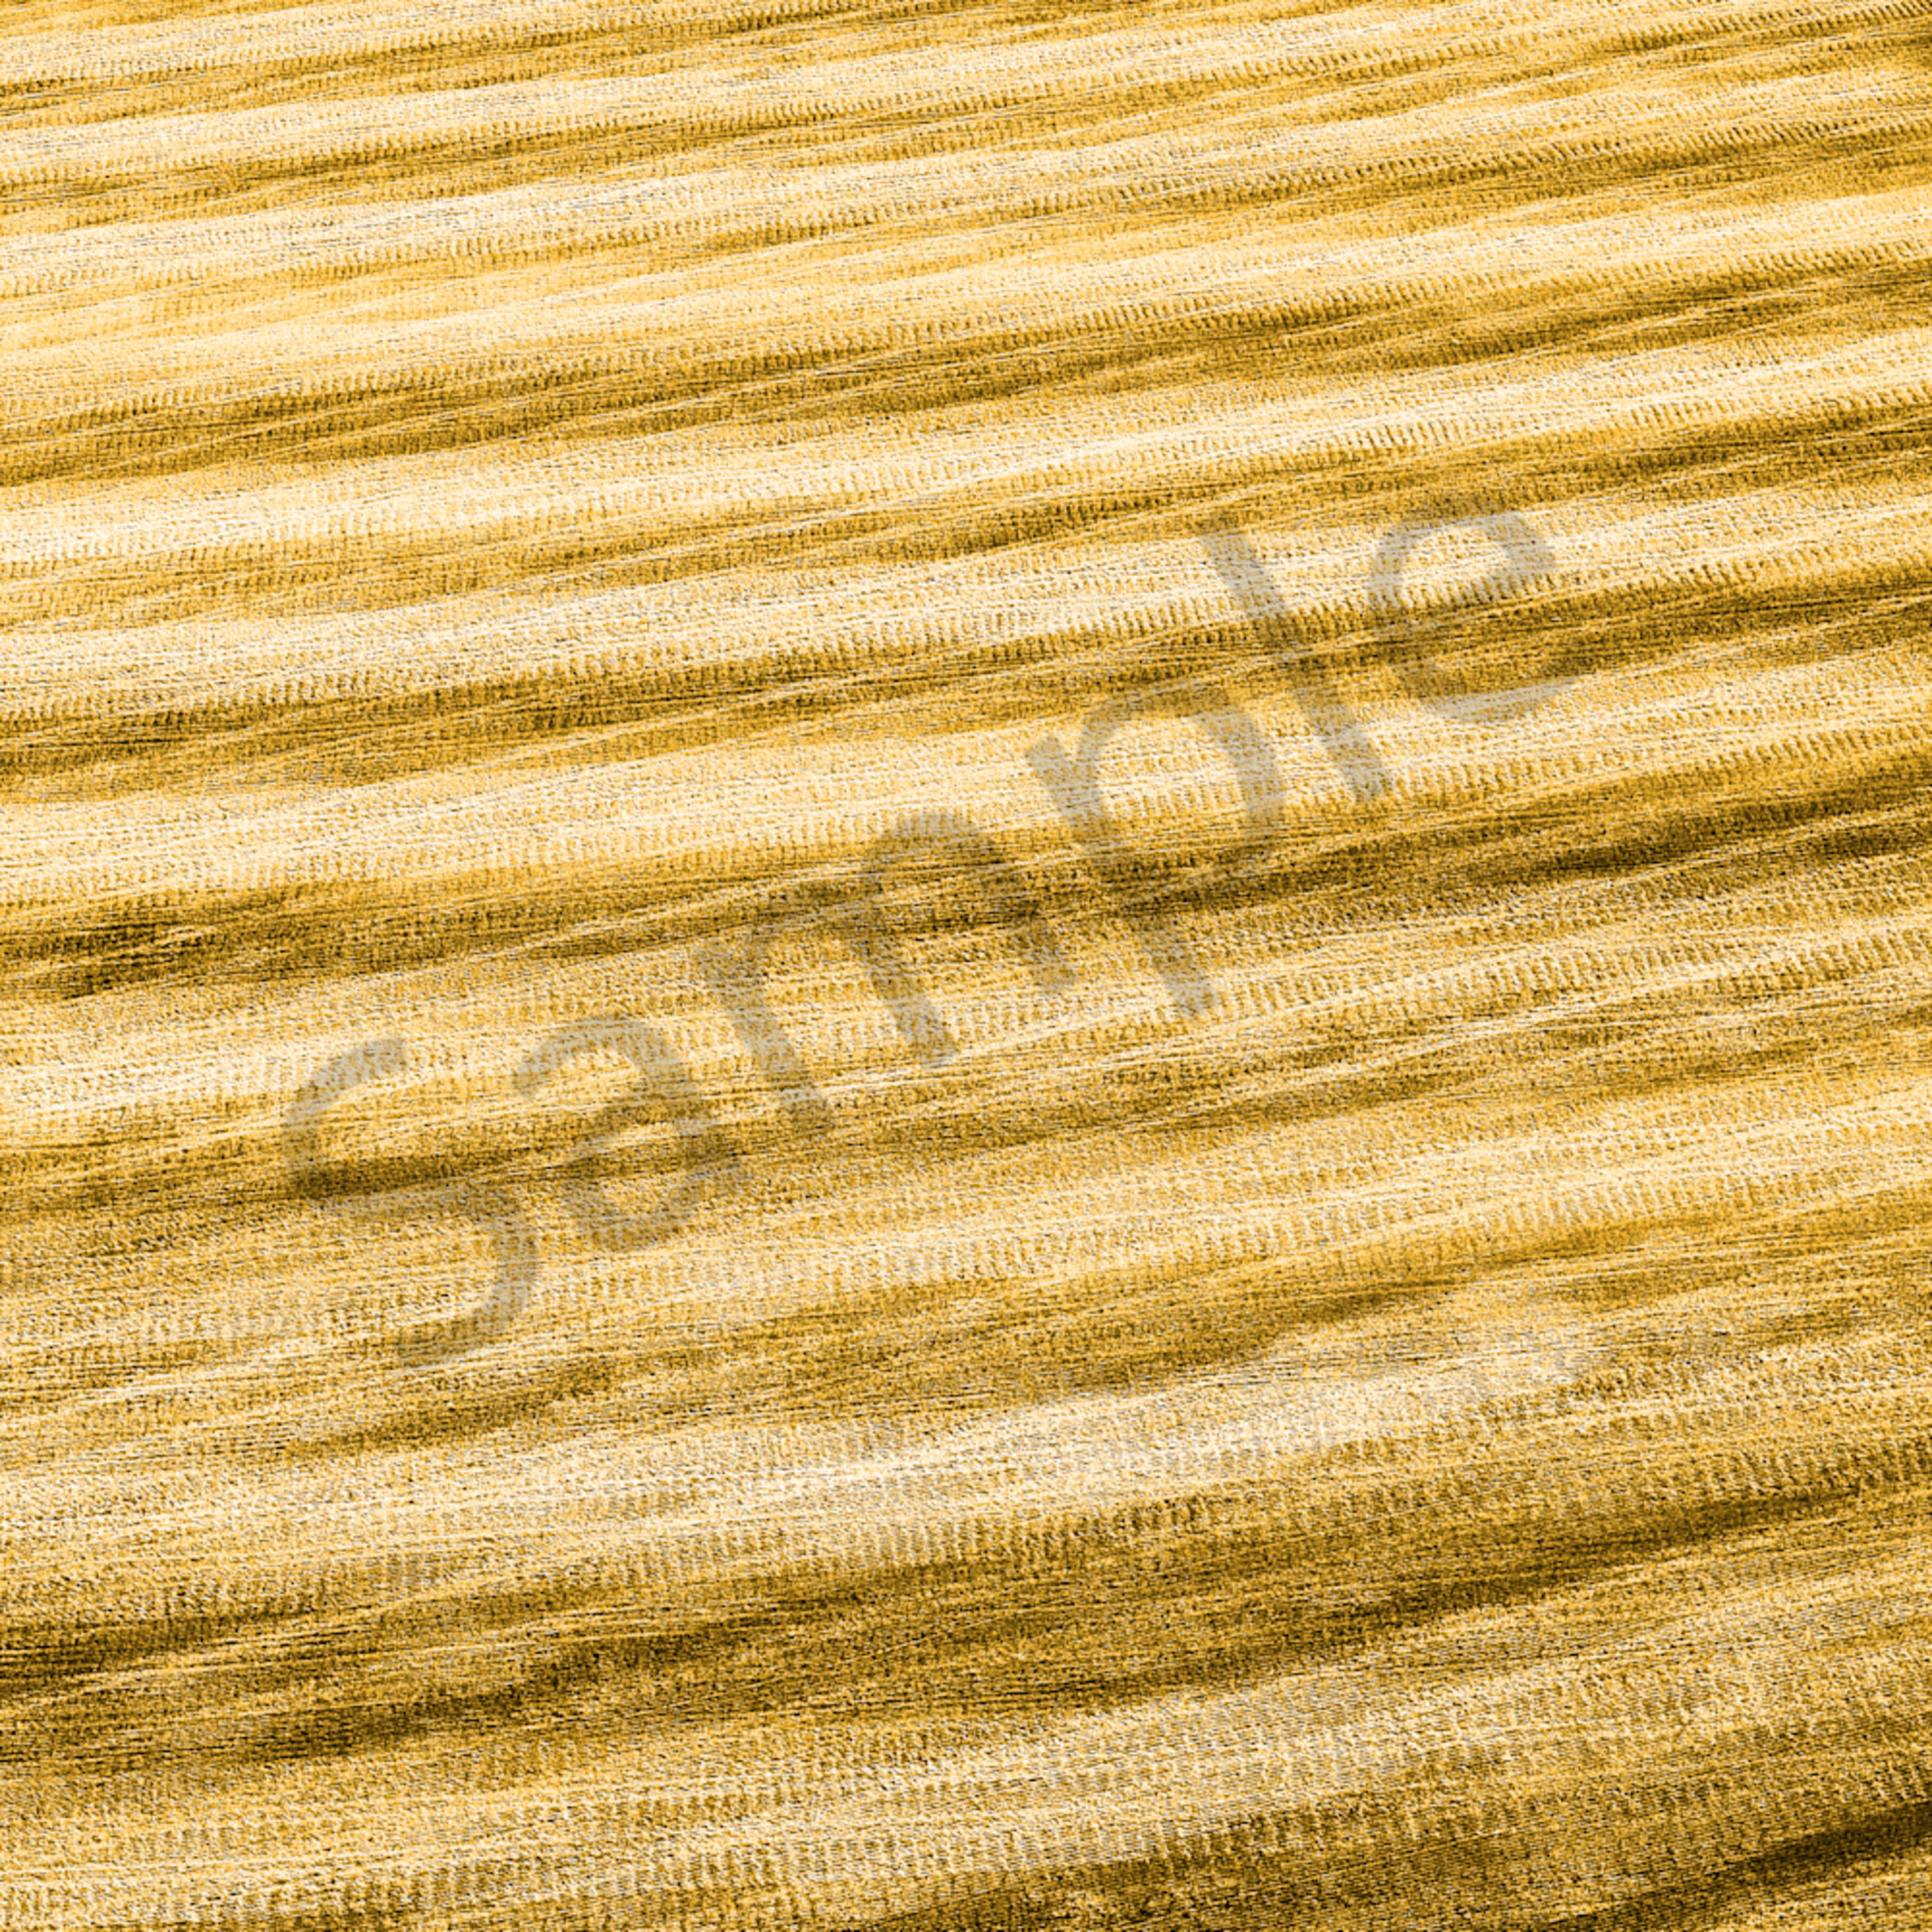 Golden golden egzosc